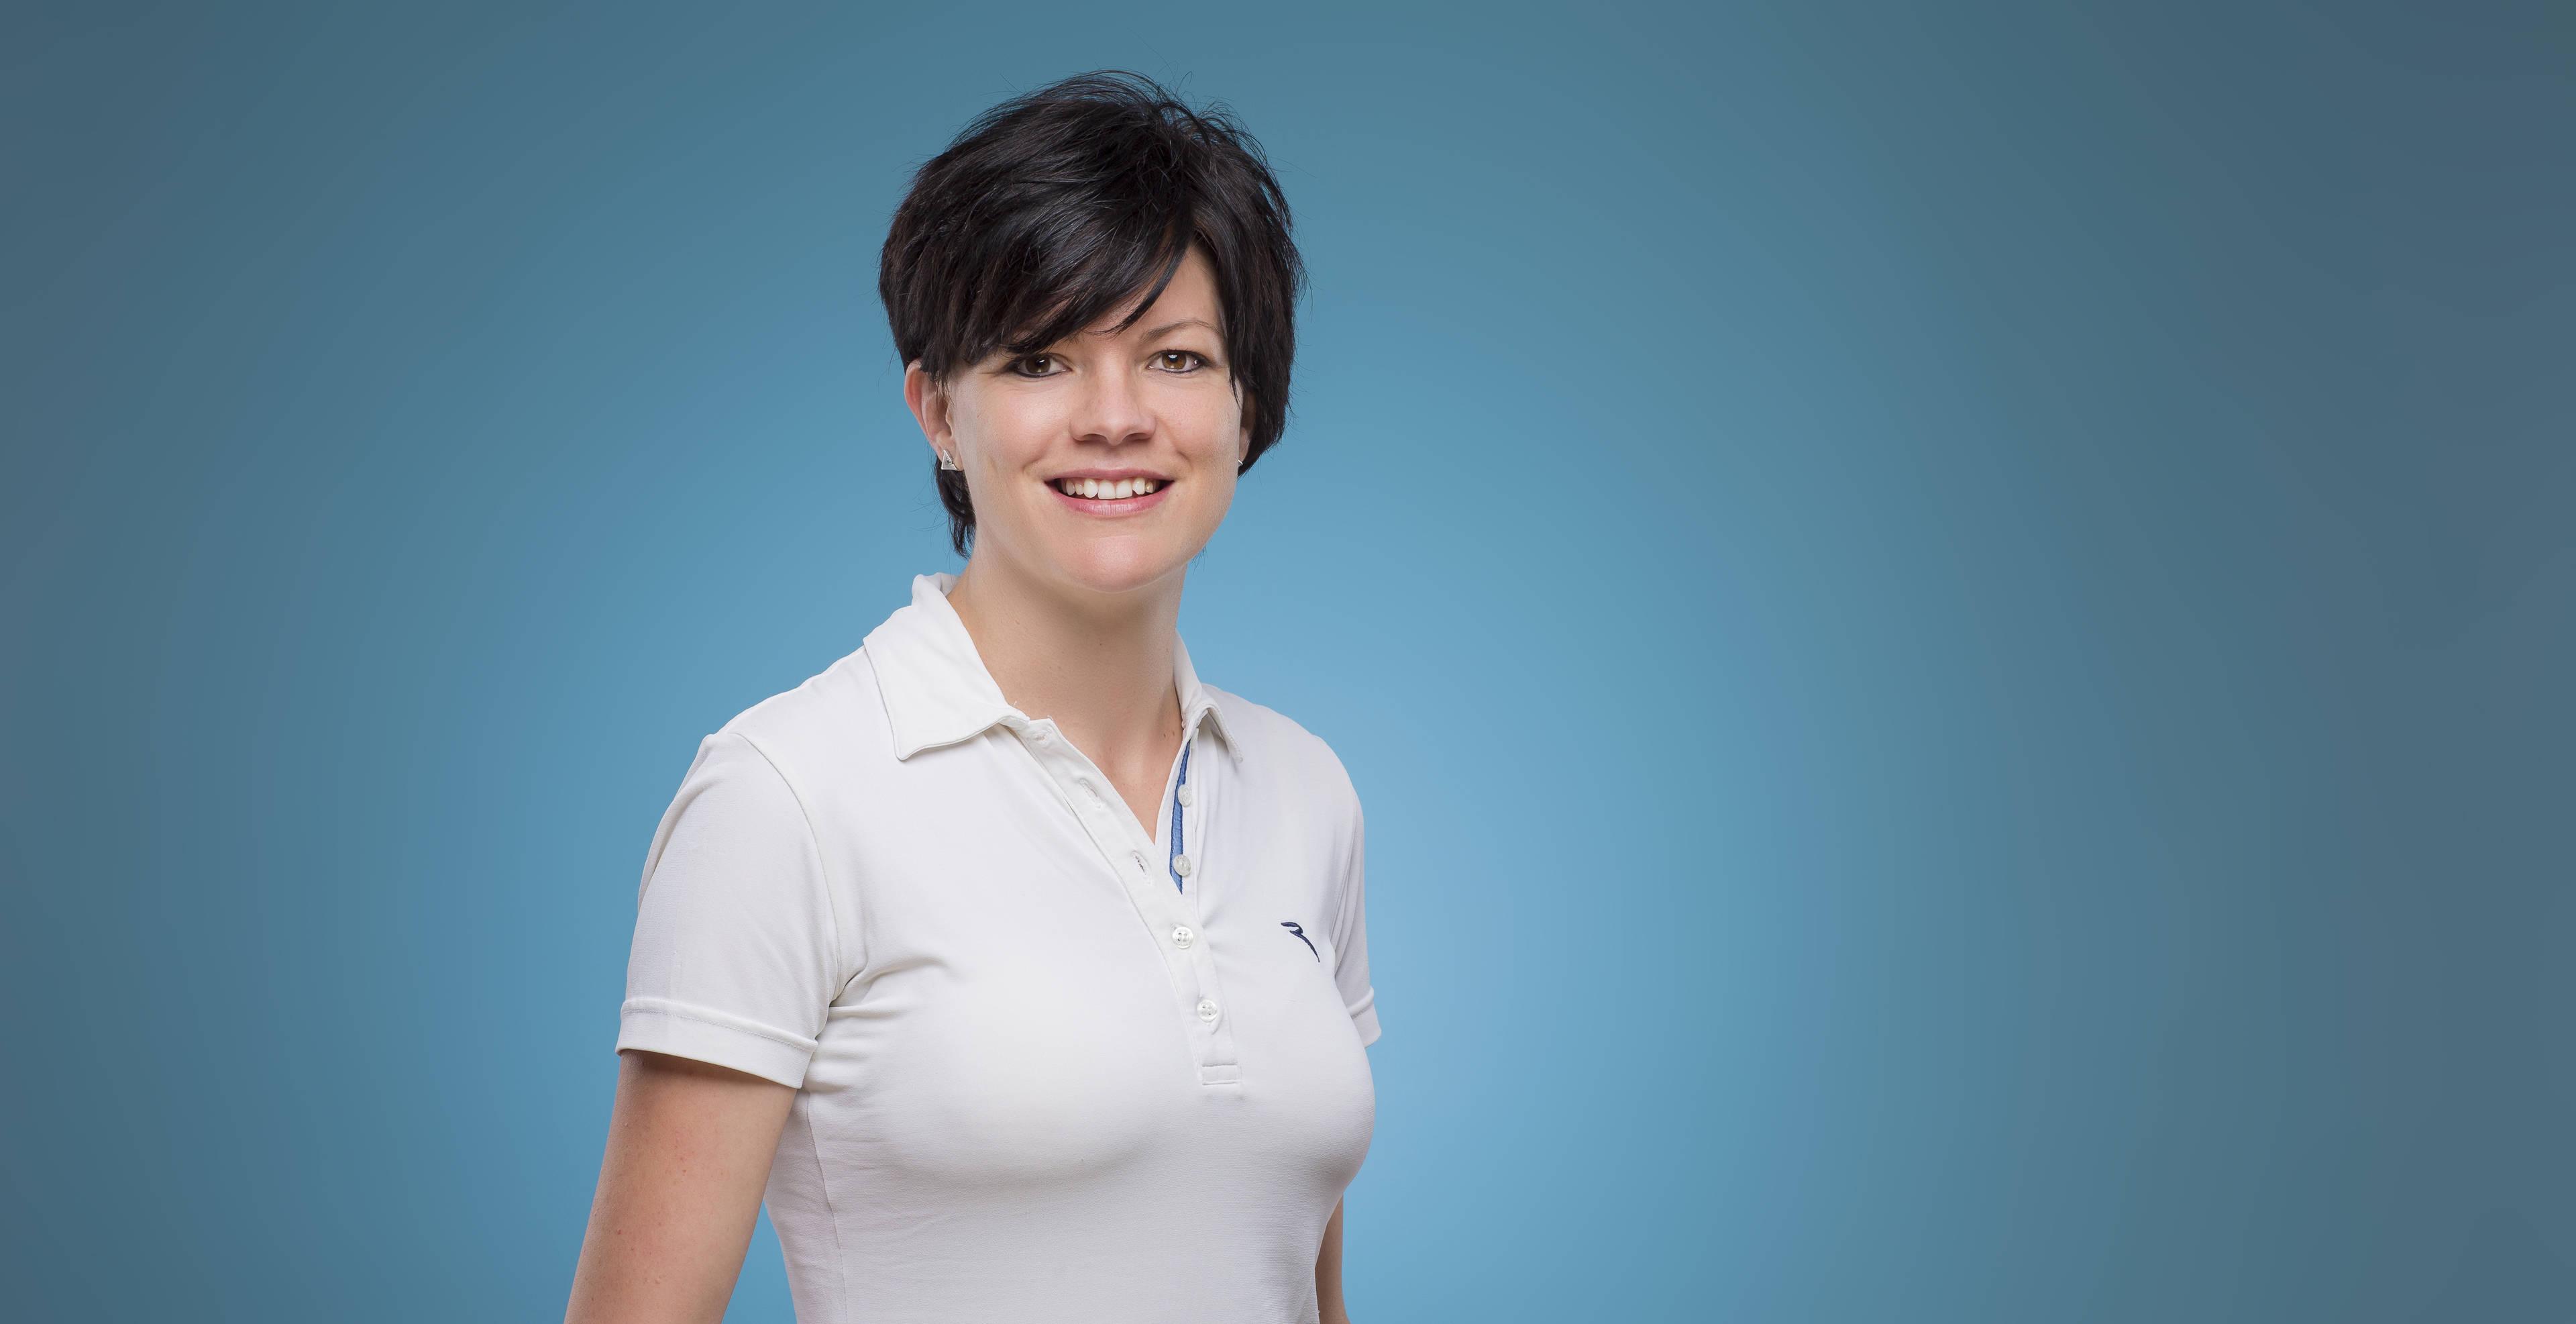 Tanja Werlen